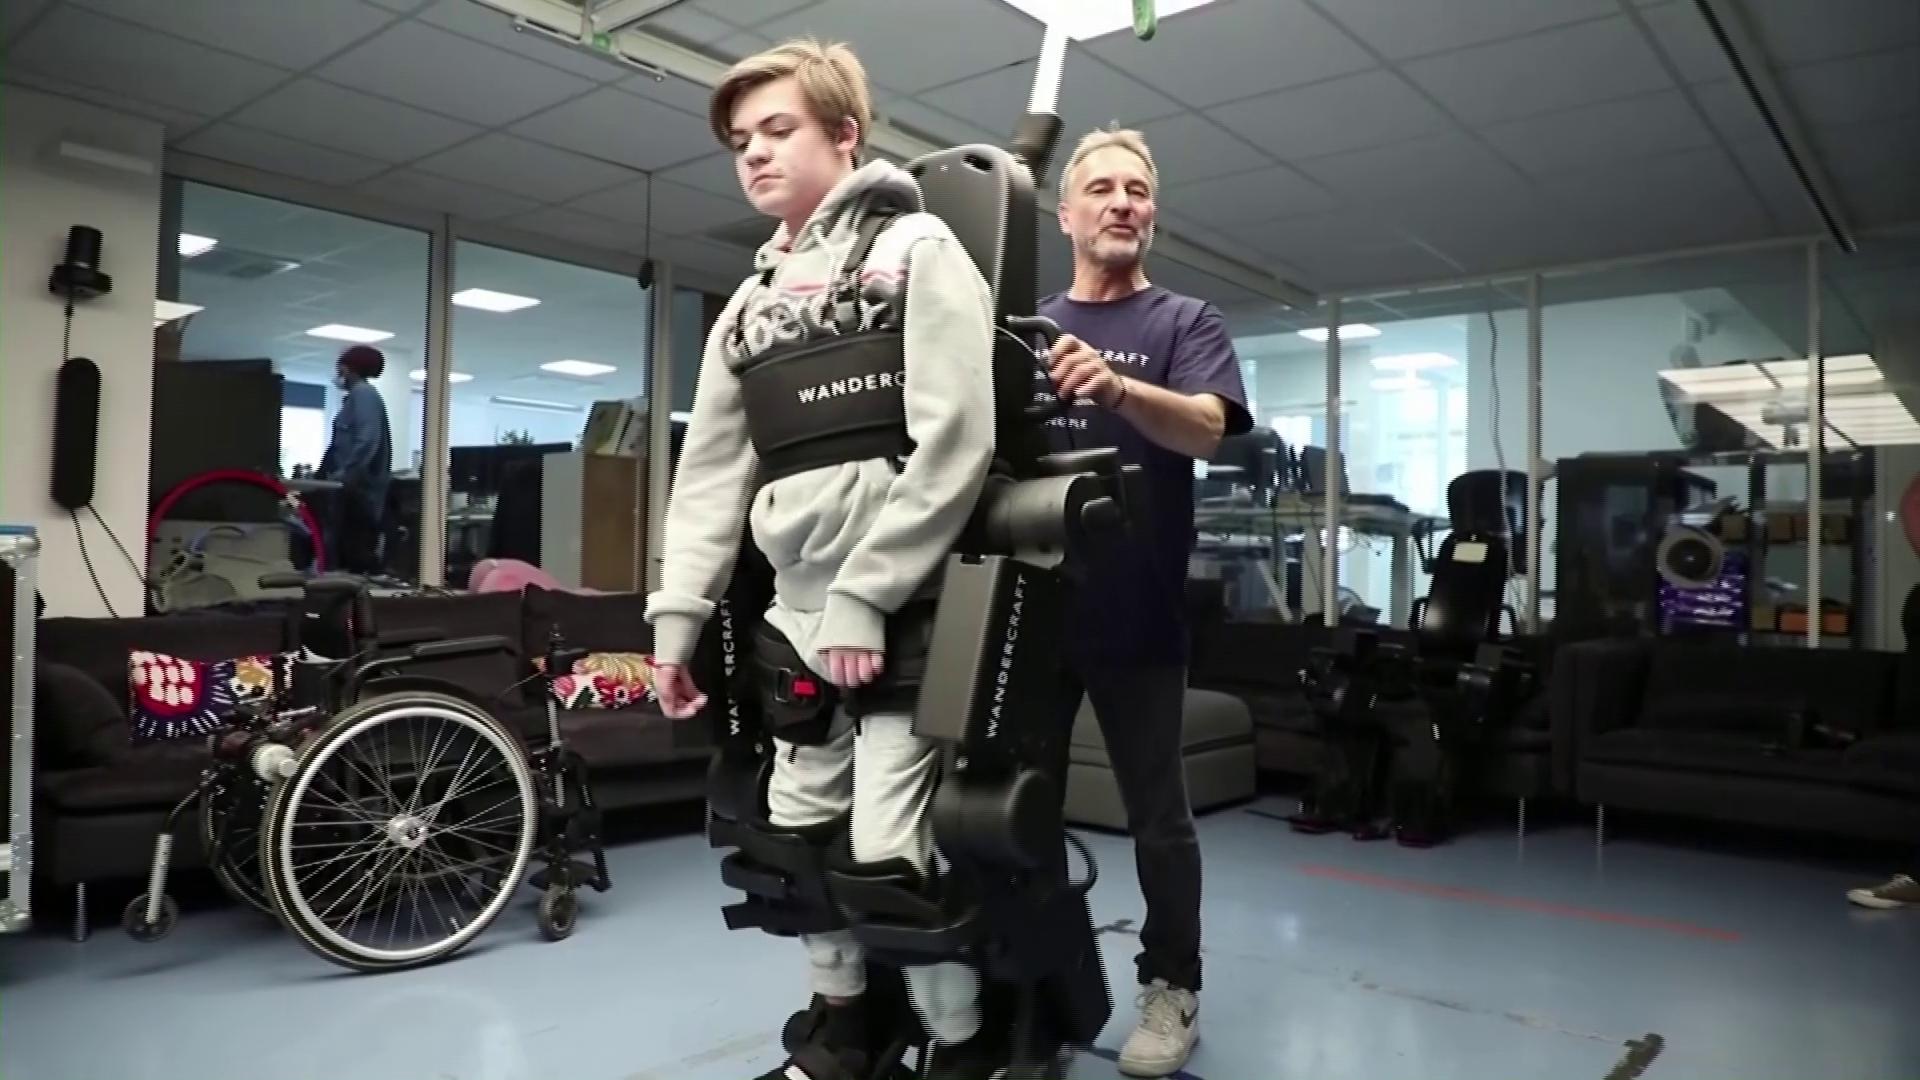 Father builds exoskeleton to help wheelchair-bound son walk